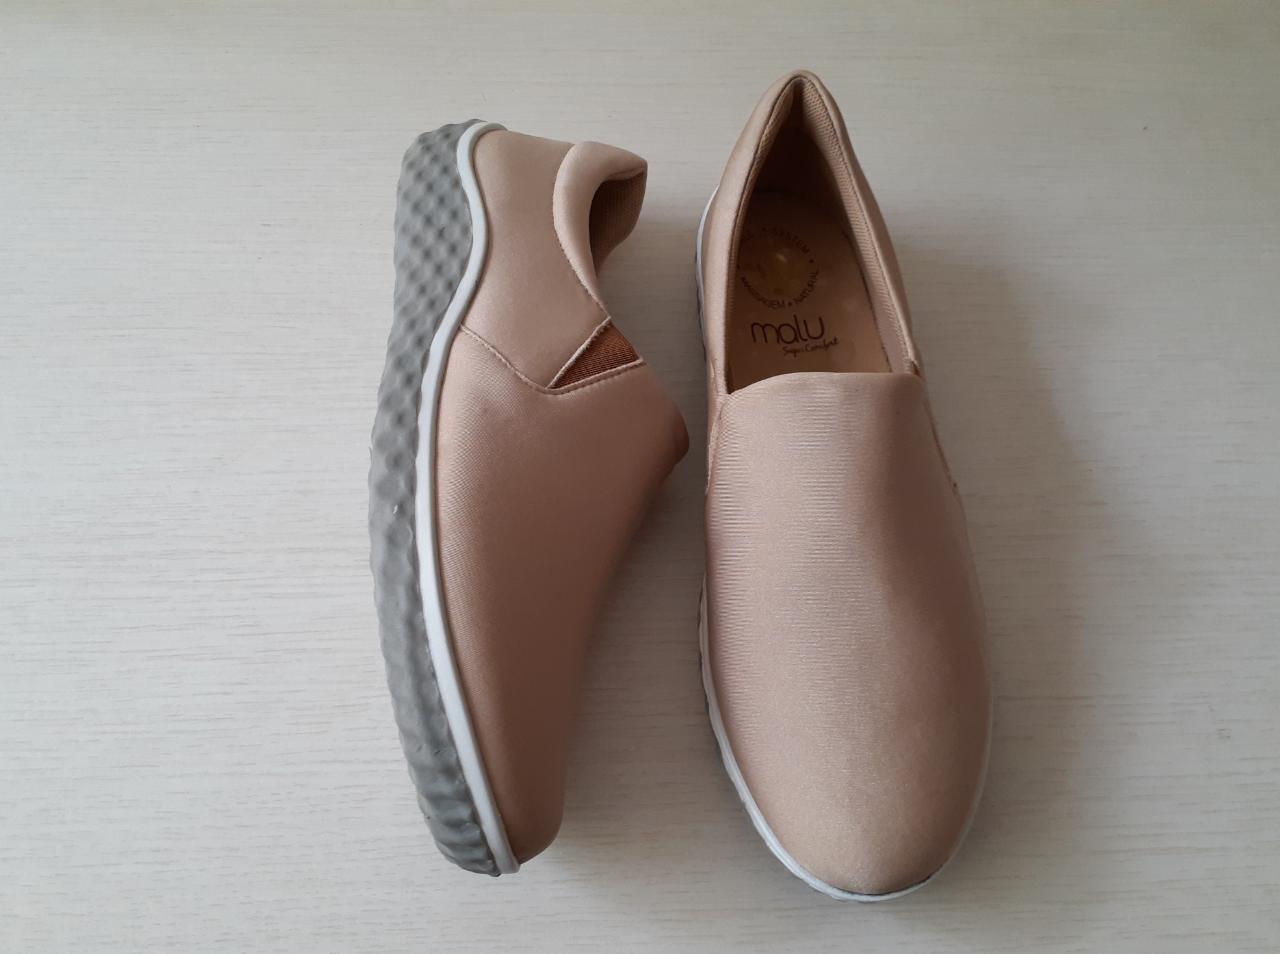 Sapatênis Comfort Malu